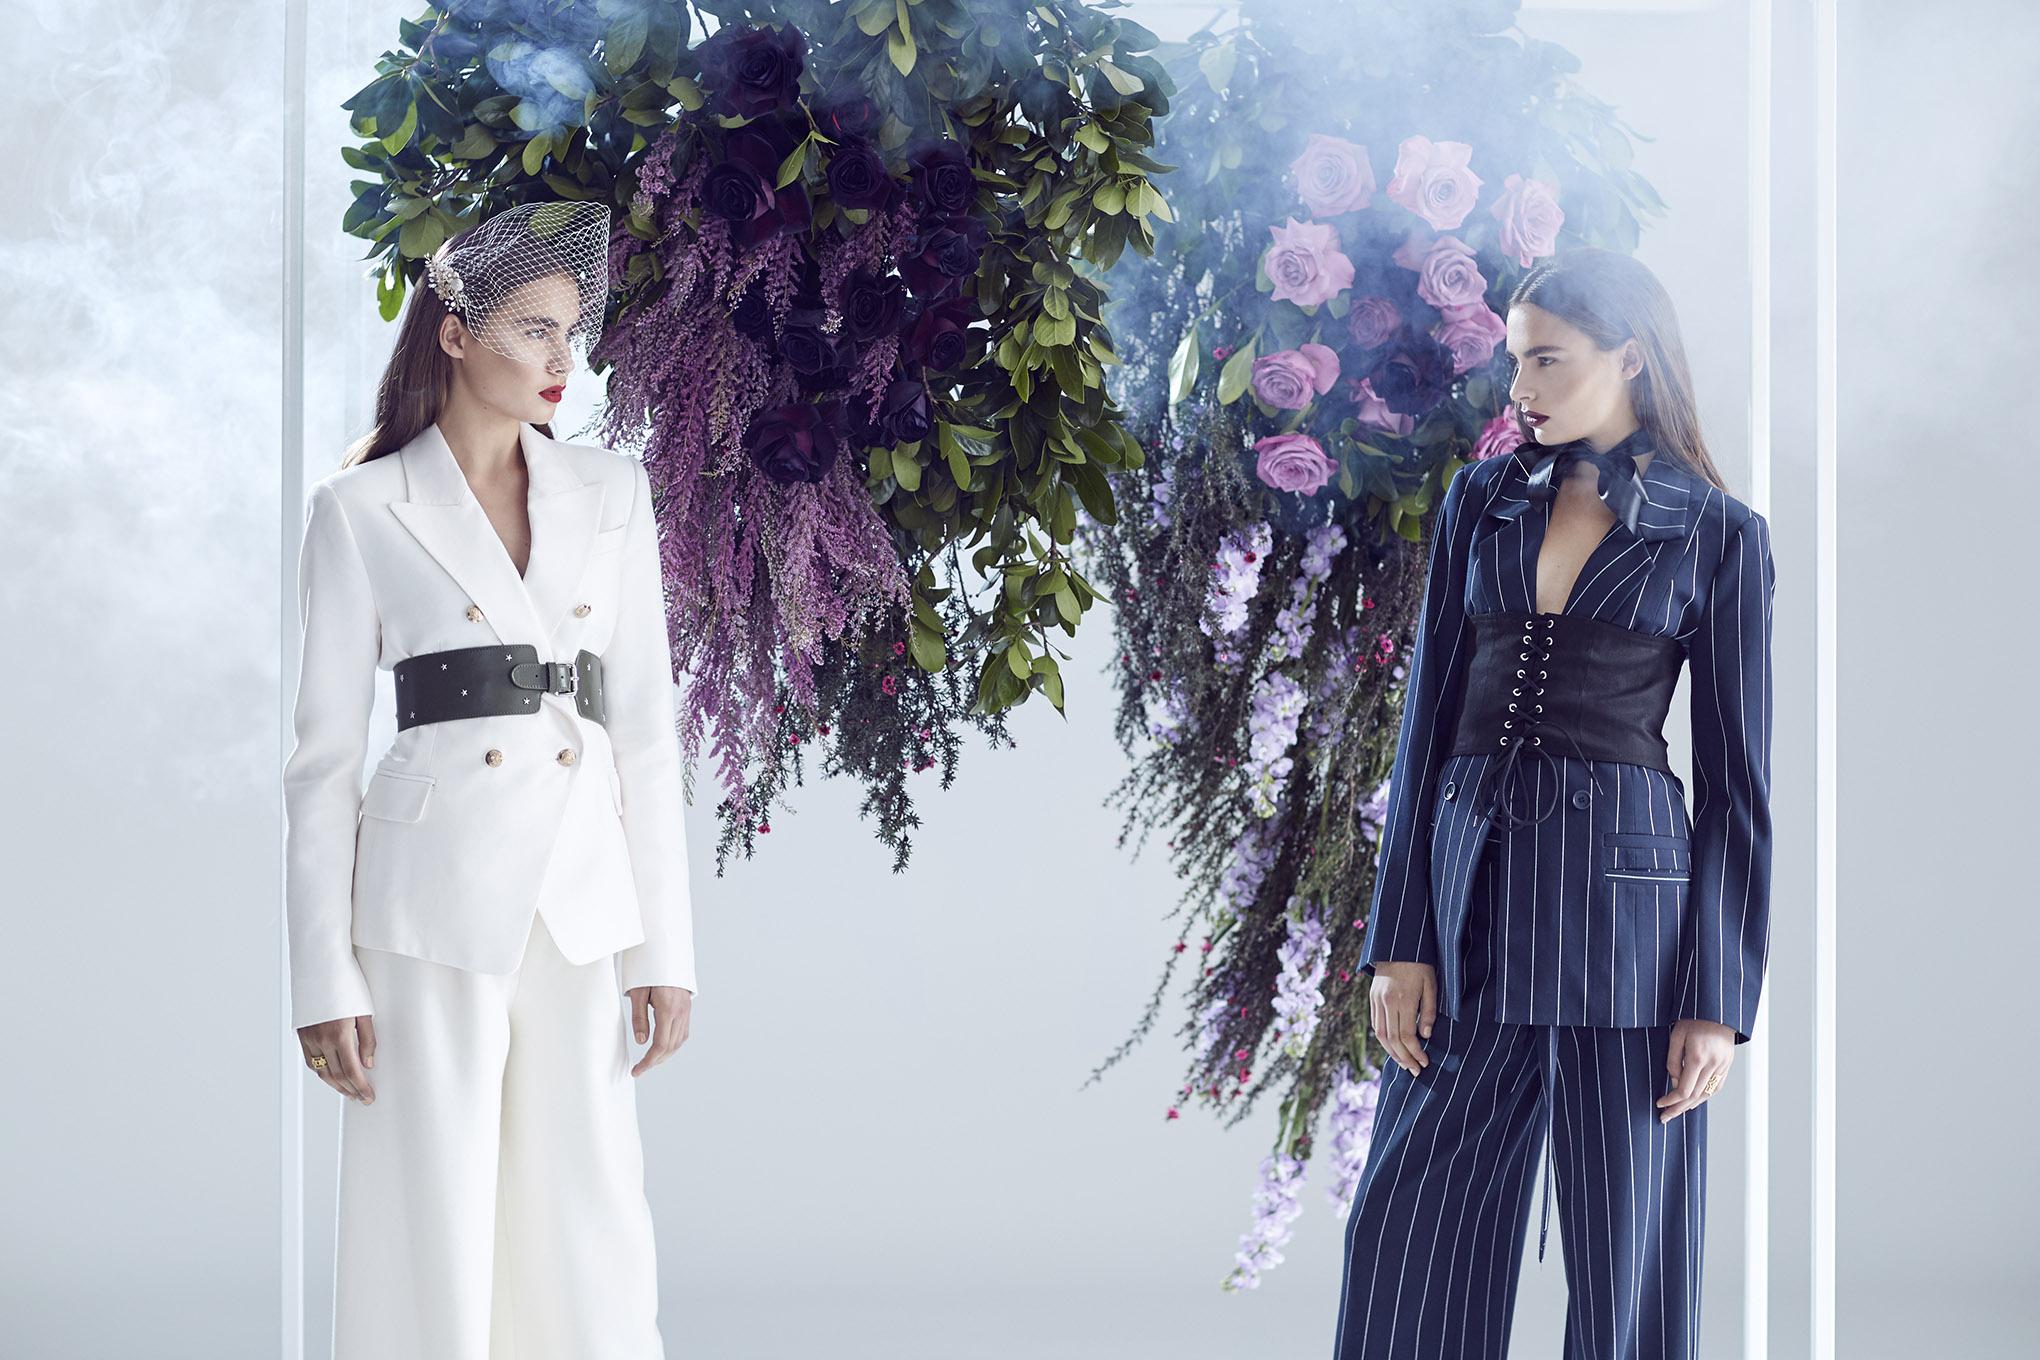 Categories: Fashion-Flora Fashion Issue 9